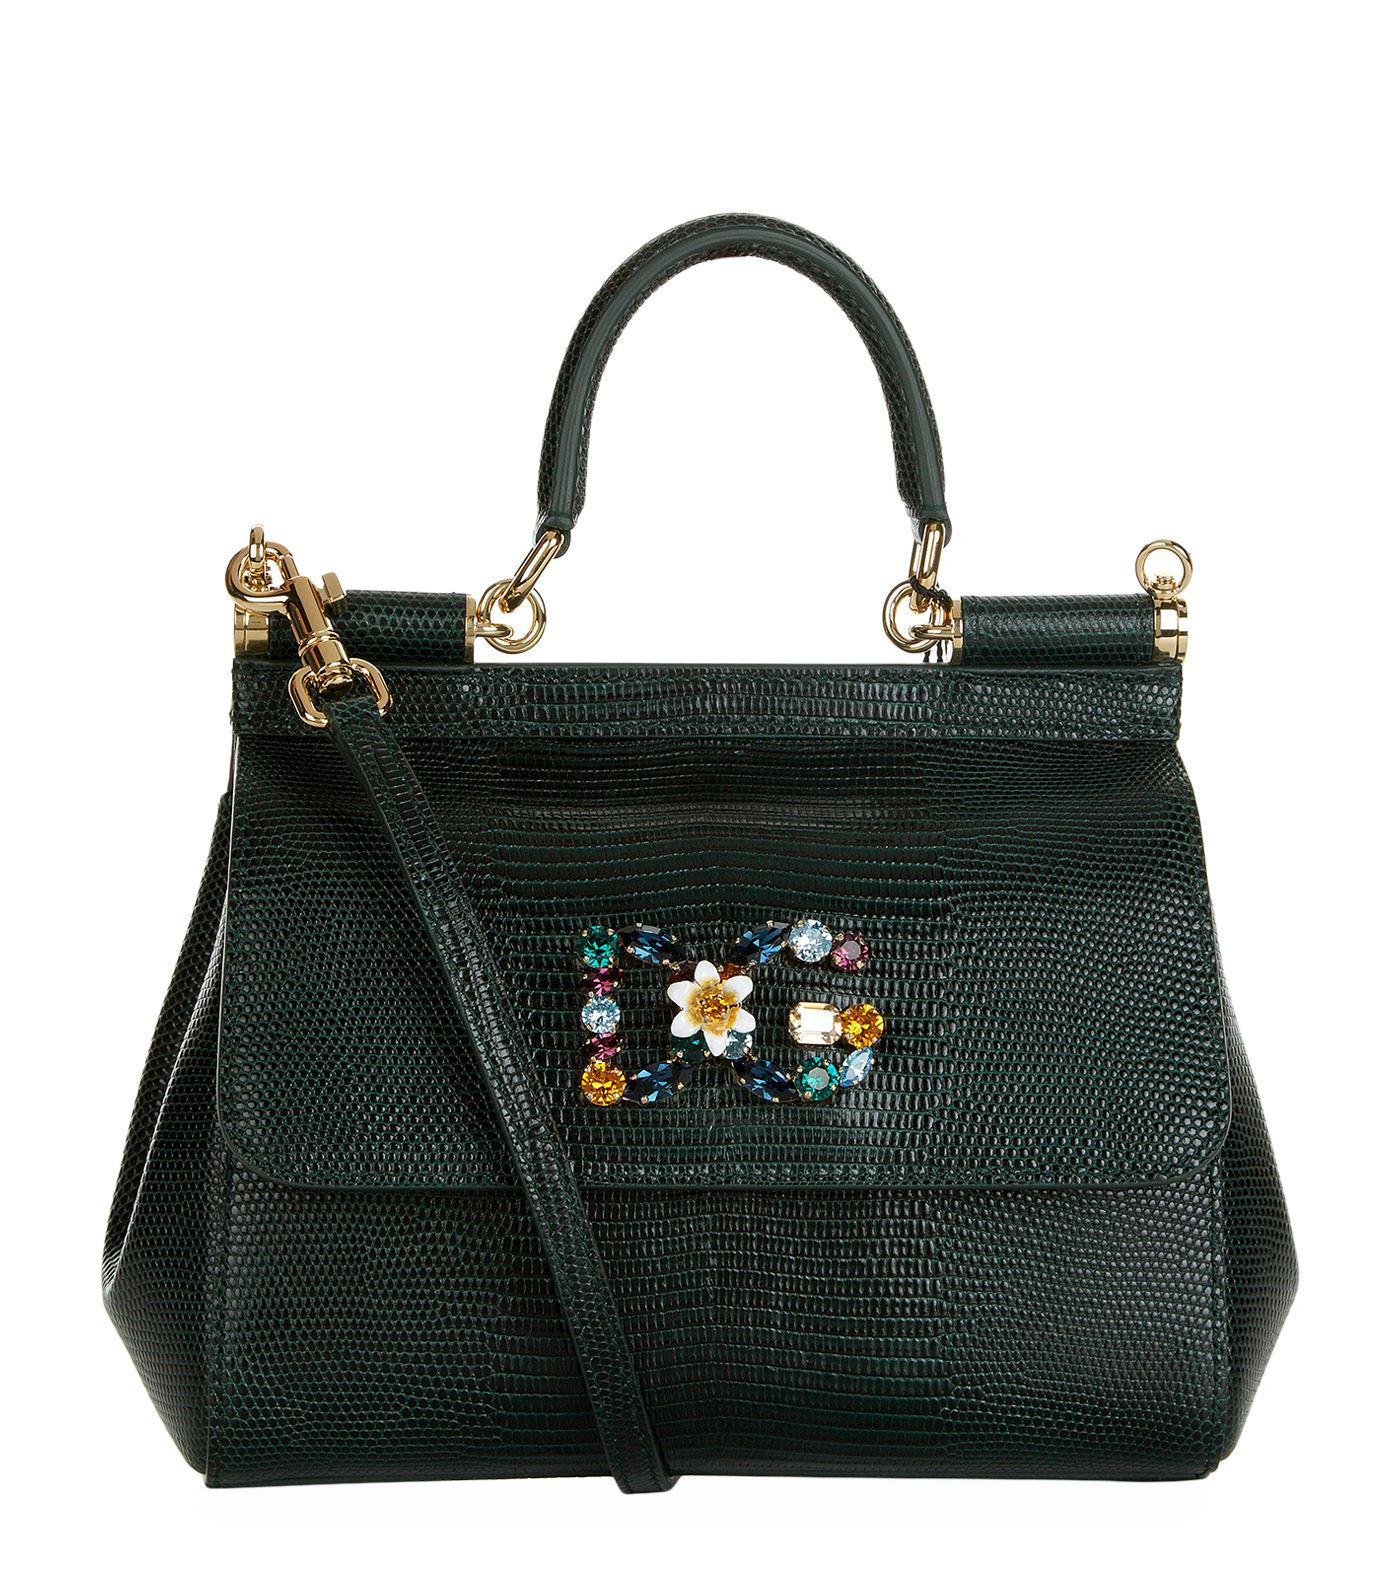 Dolce   Gabbana. Women s Black Small Leather Iguana Print Sicily Bag a545782abb5d3